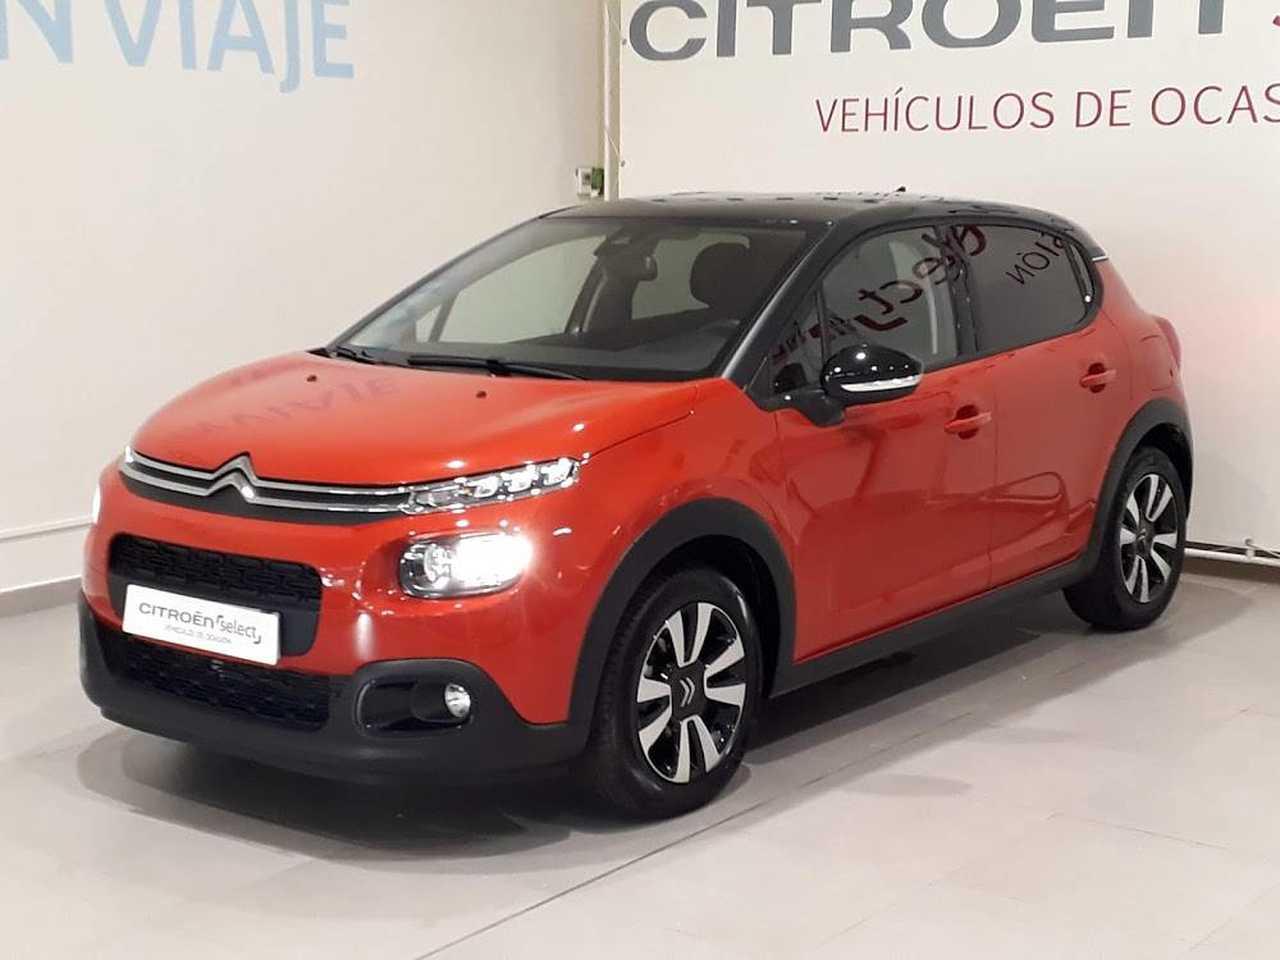 Citroën C3 Gasolina en Sevilla